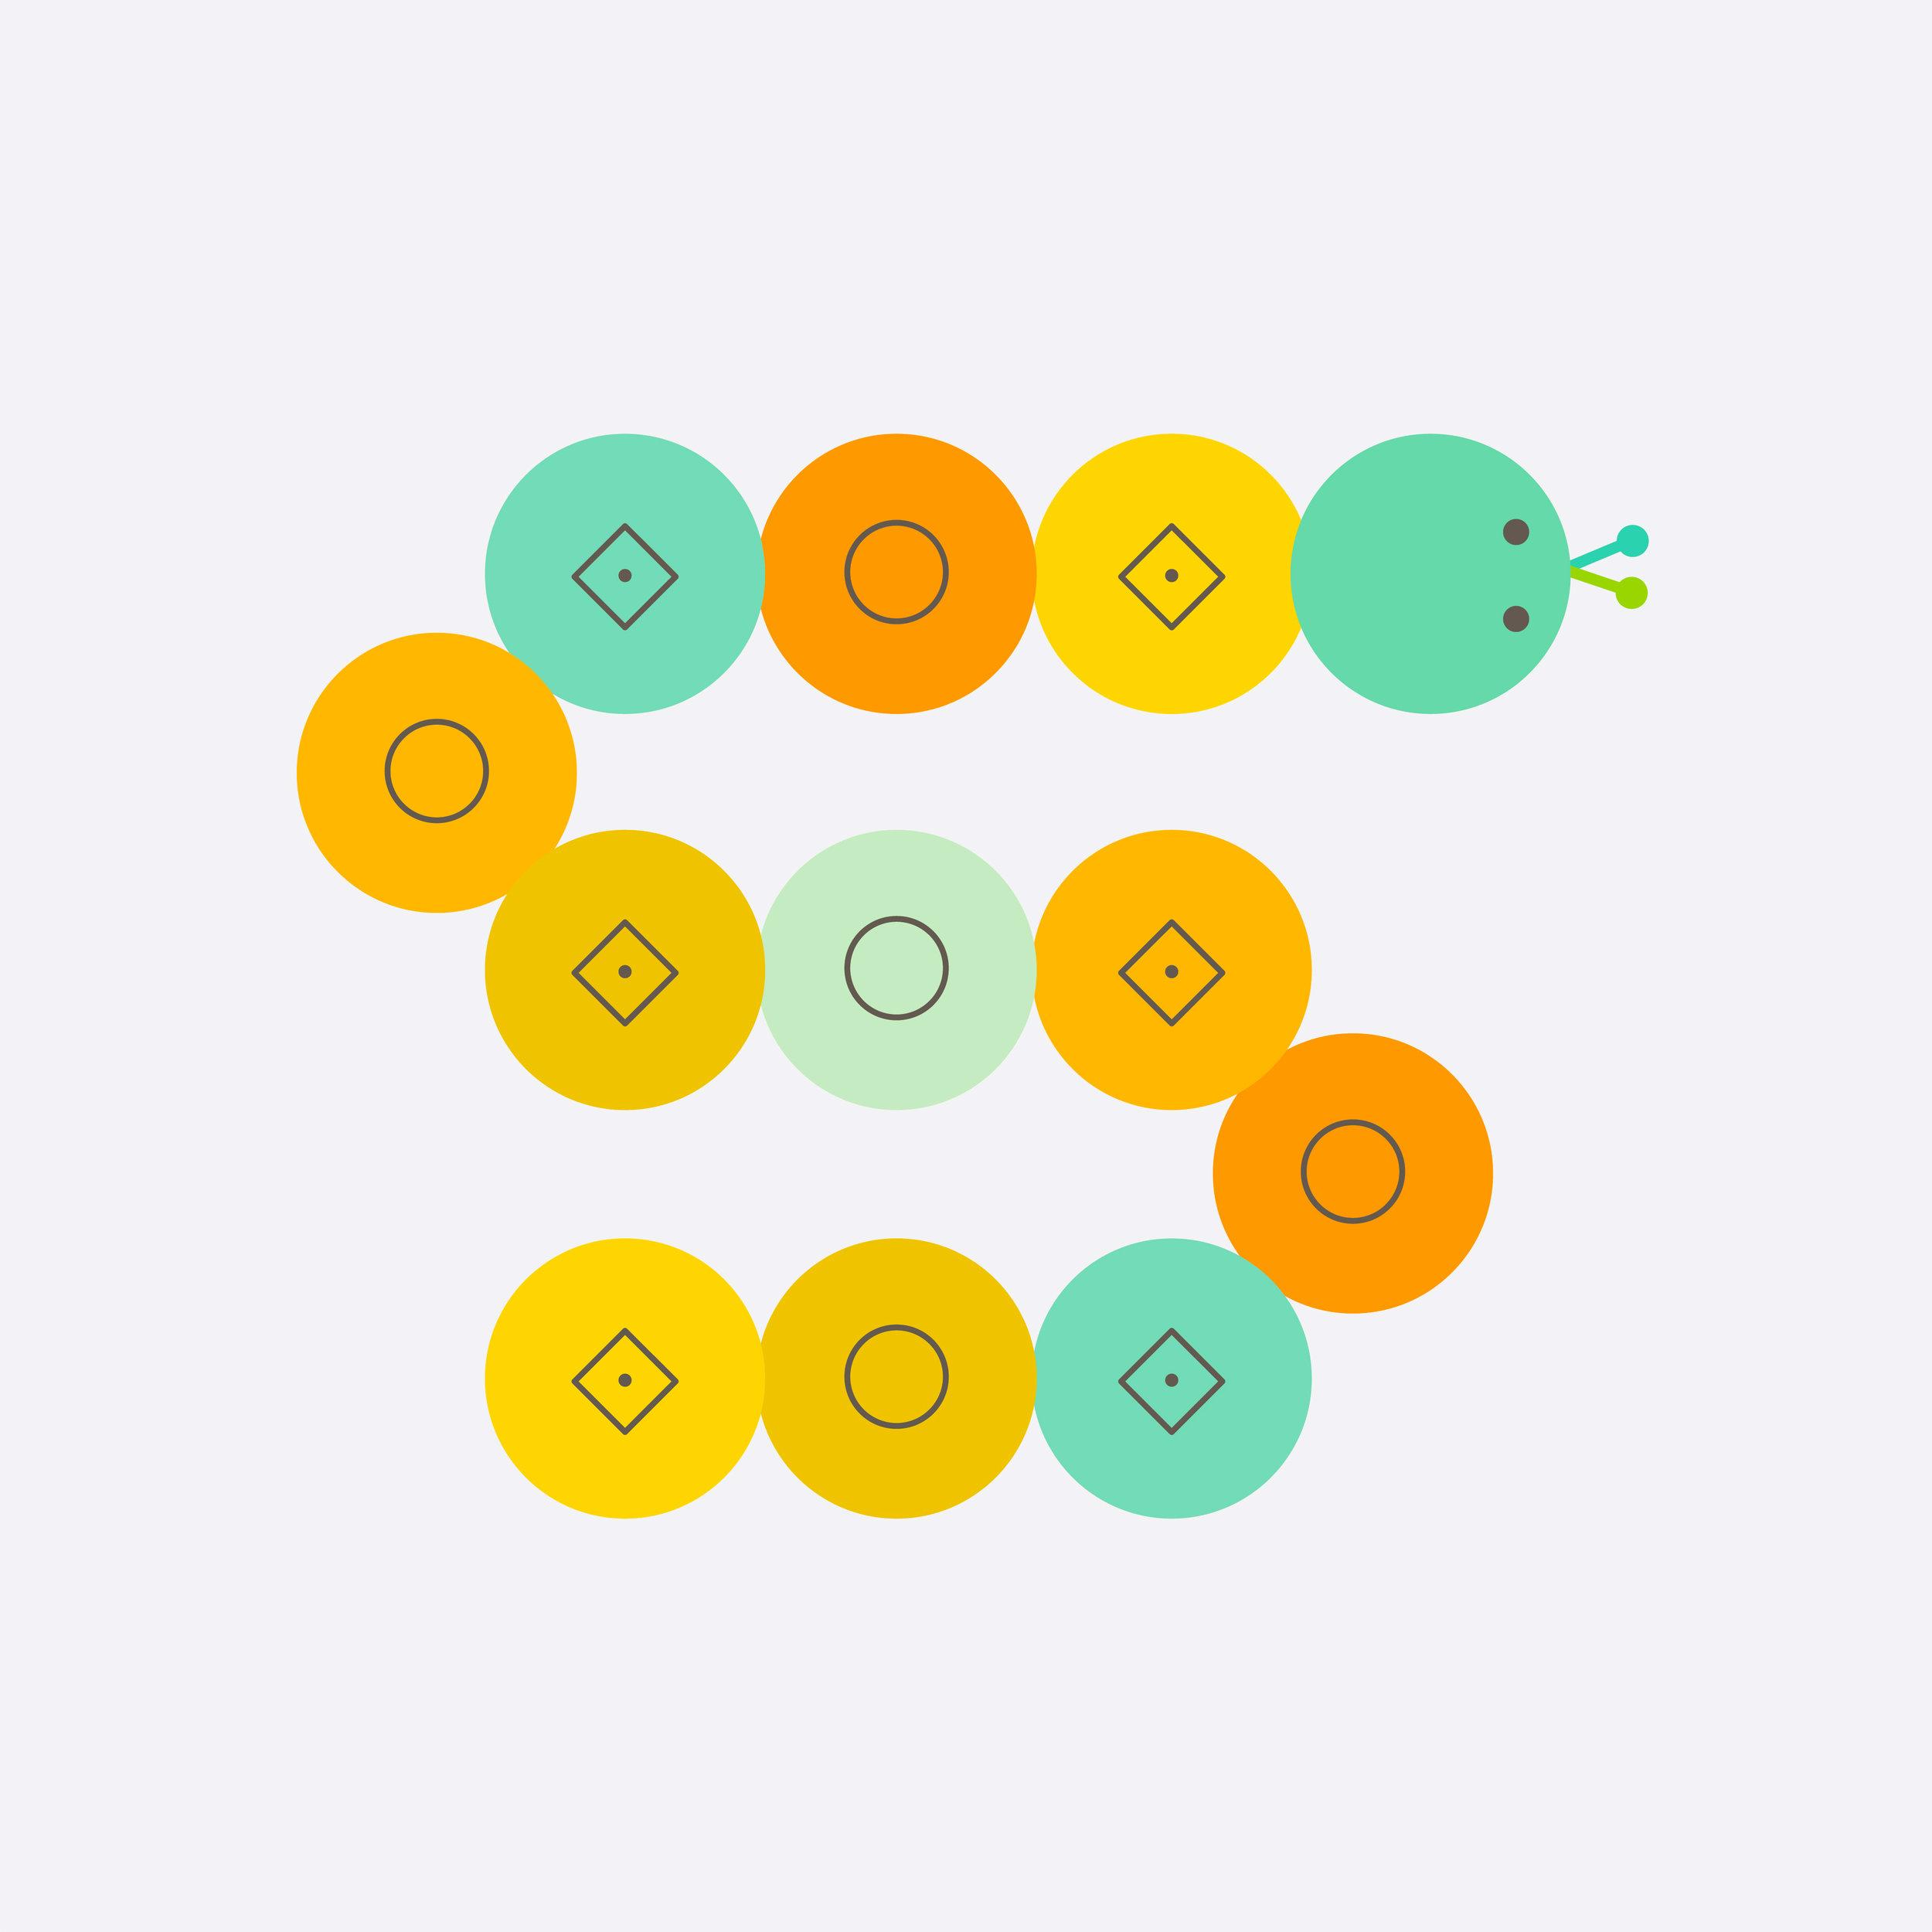 caterpillar-14-15-15.jpg